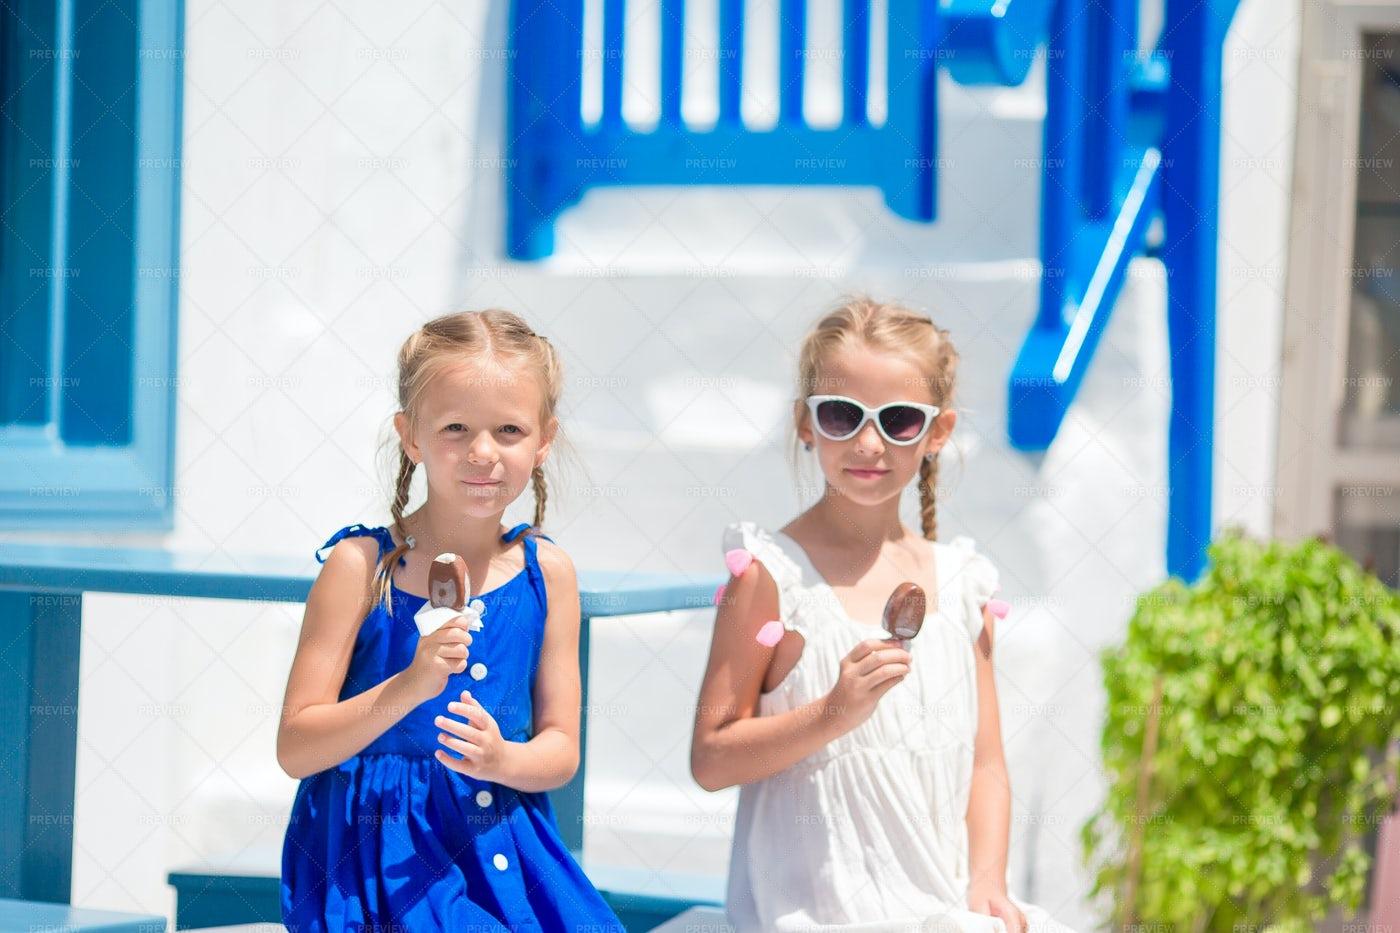 Girls In Blue Dresses: Stock Photos